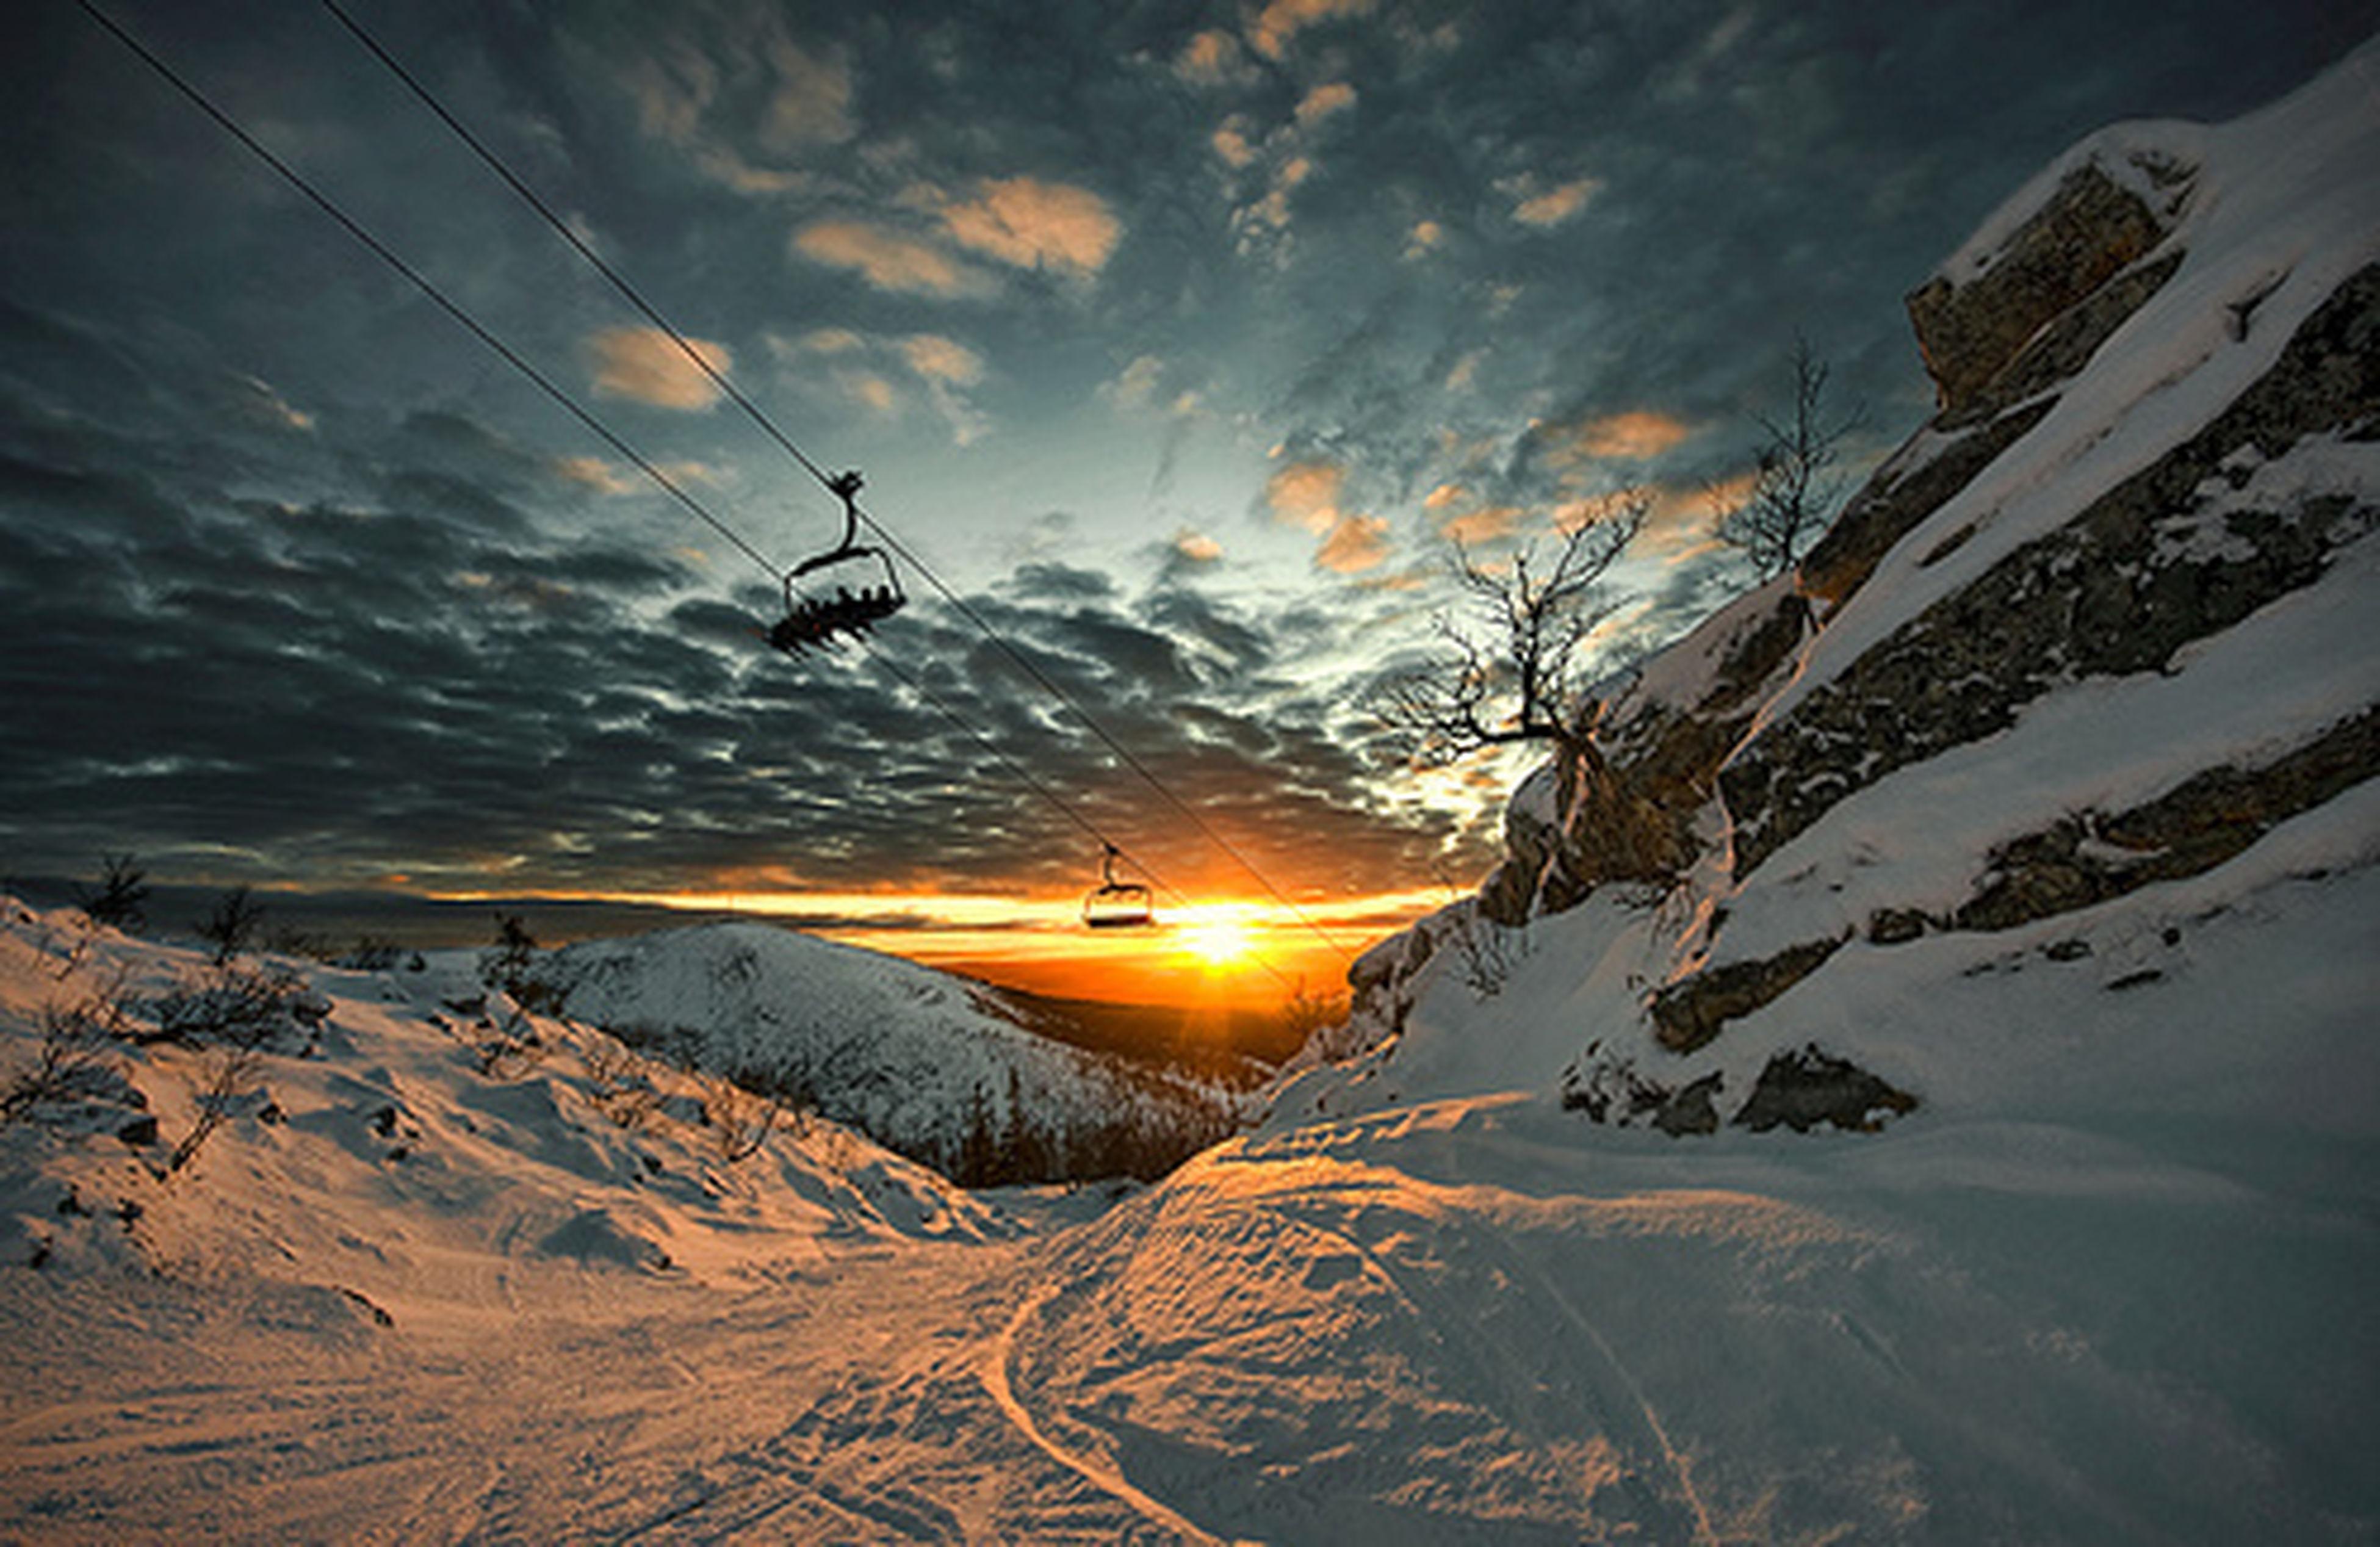 sunset, snow, sun, sky, transportation, winter, scenics, cold temperature, mountain, landscape, beauty in nature, cloud - sky, tranquil scene, mode of transport, tranquility, nature, sunlight, travel, season, sunbeam